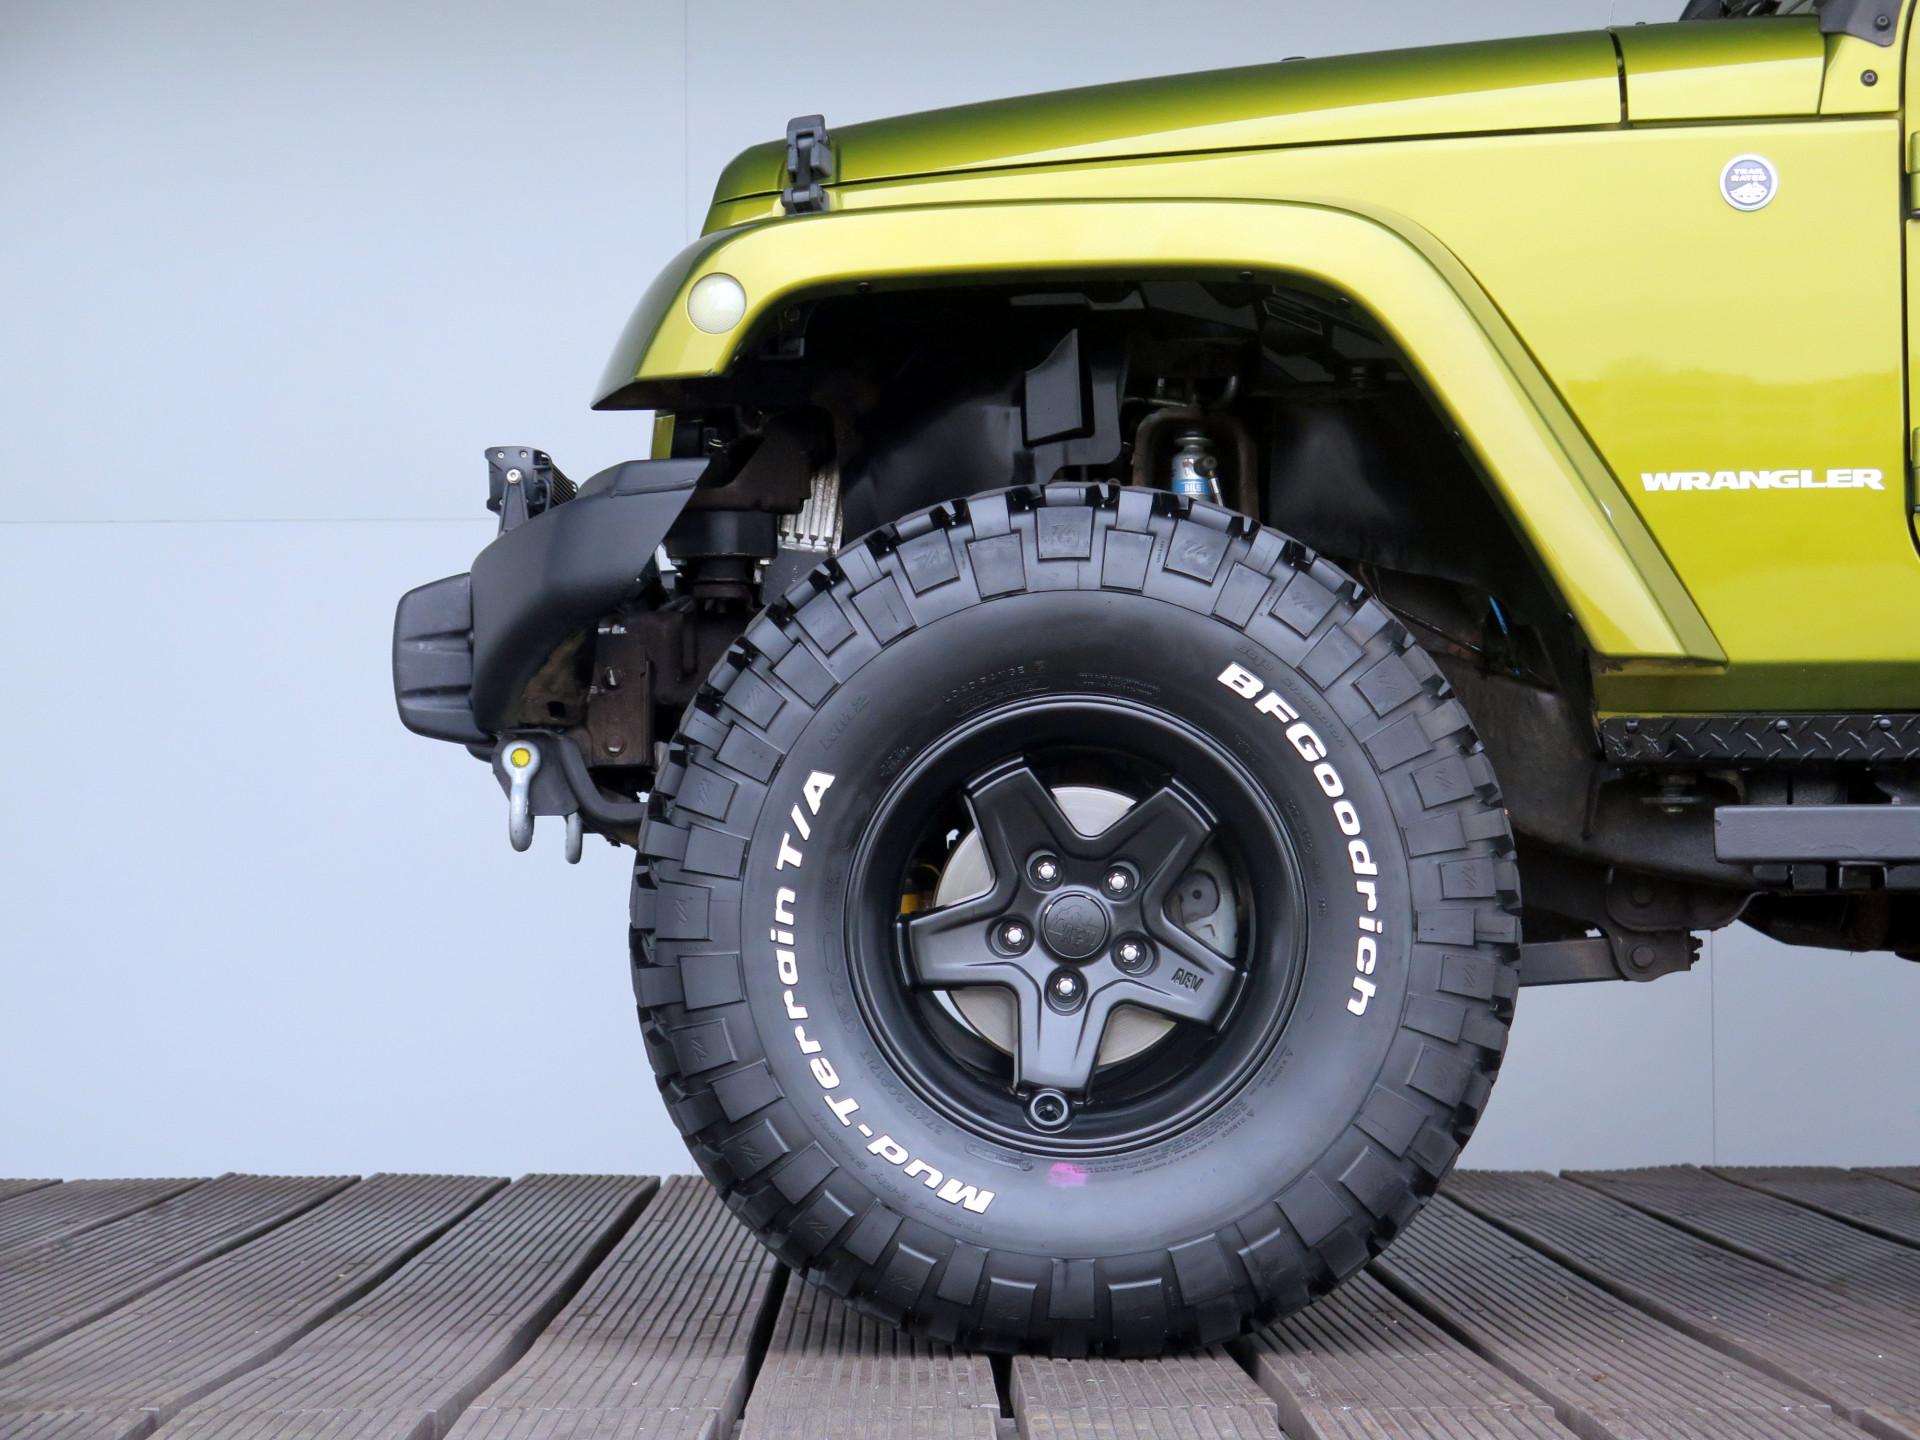 Tweedehands Jeep Wrangler V6 occasion